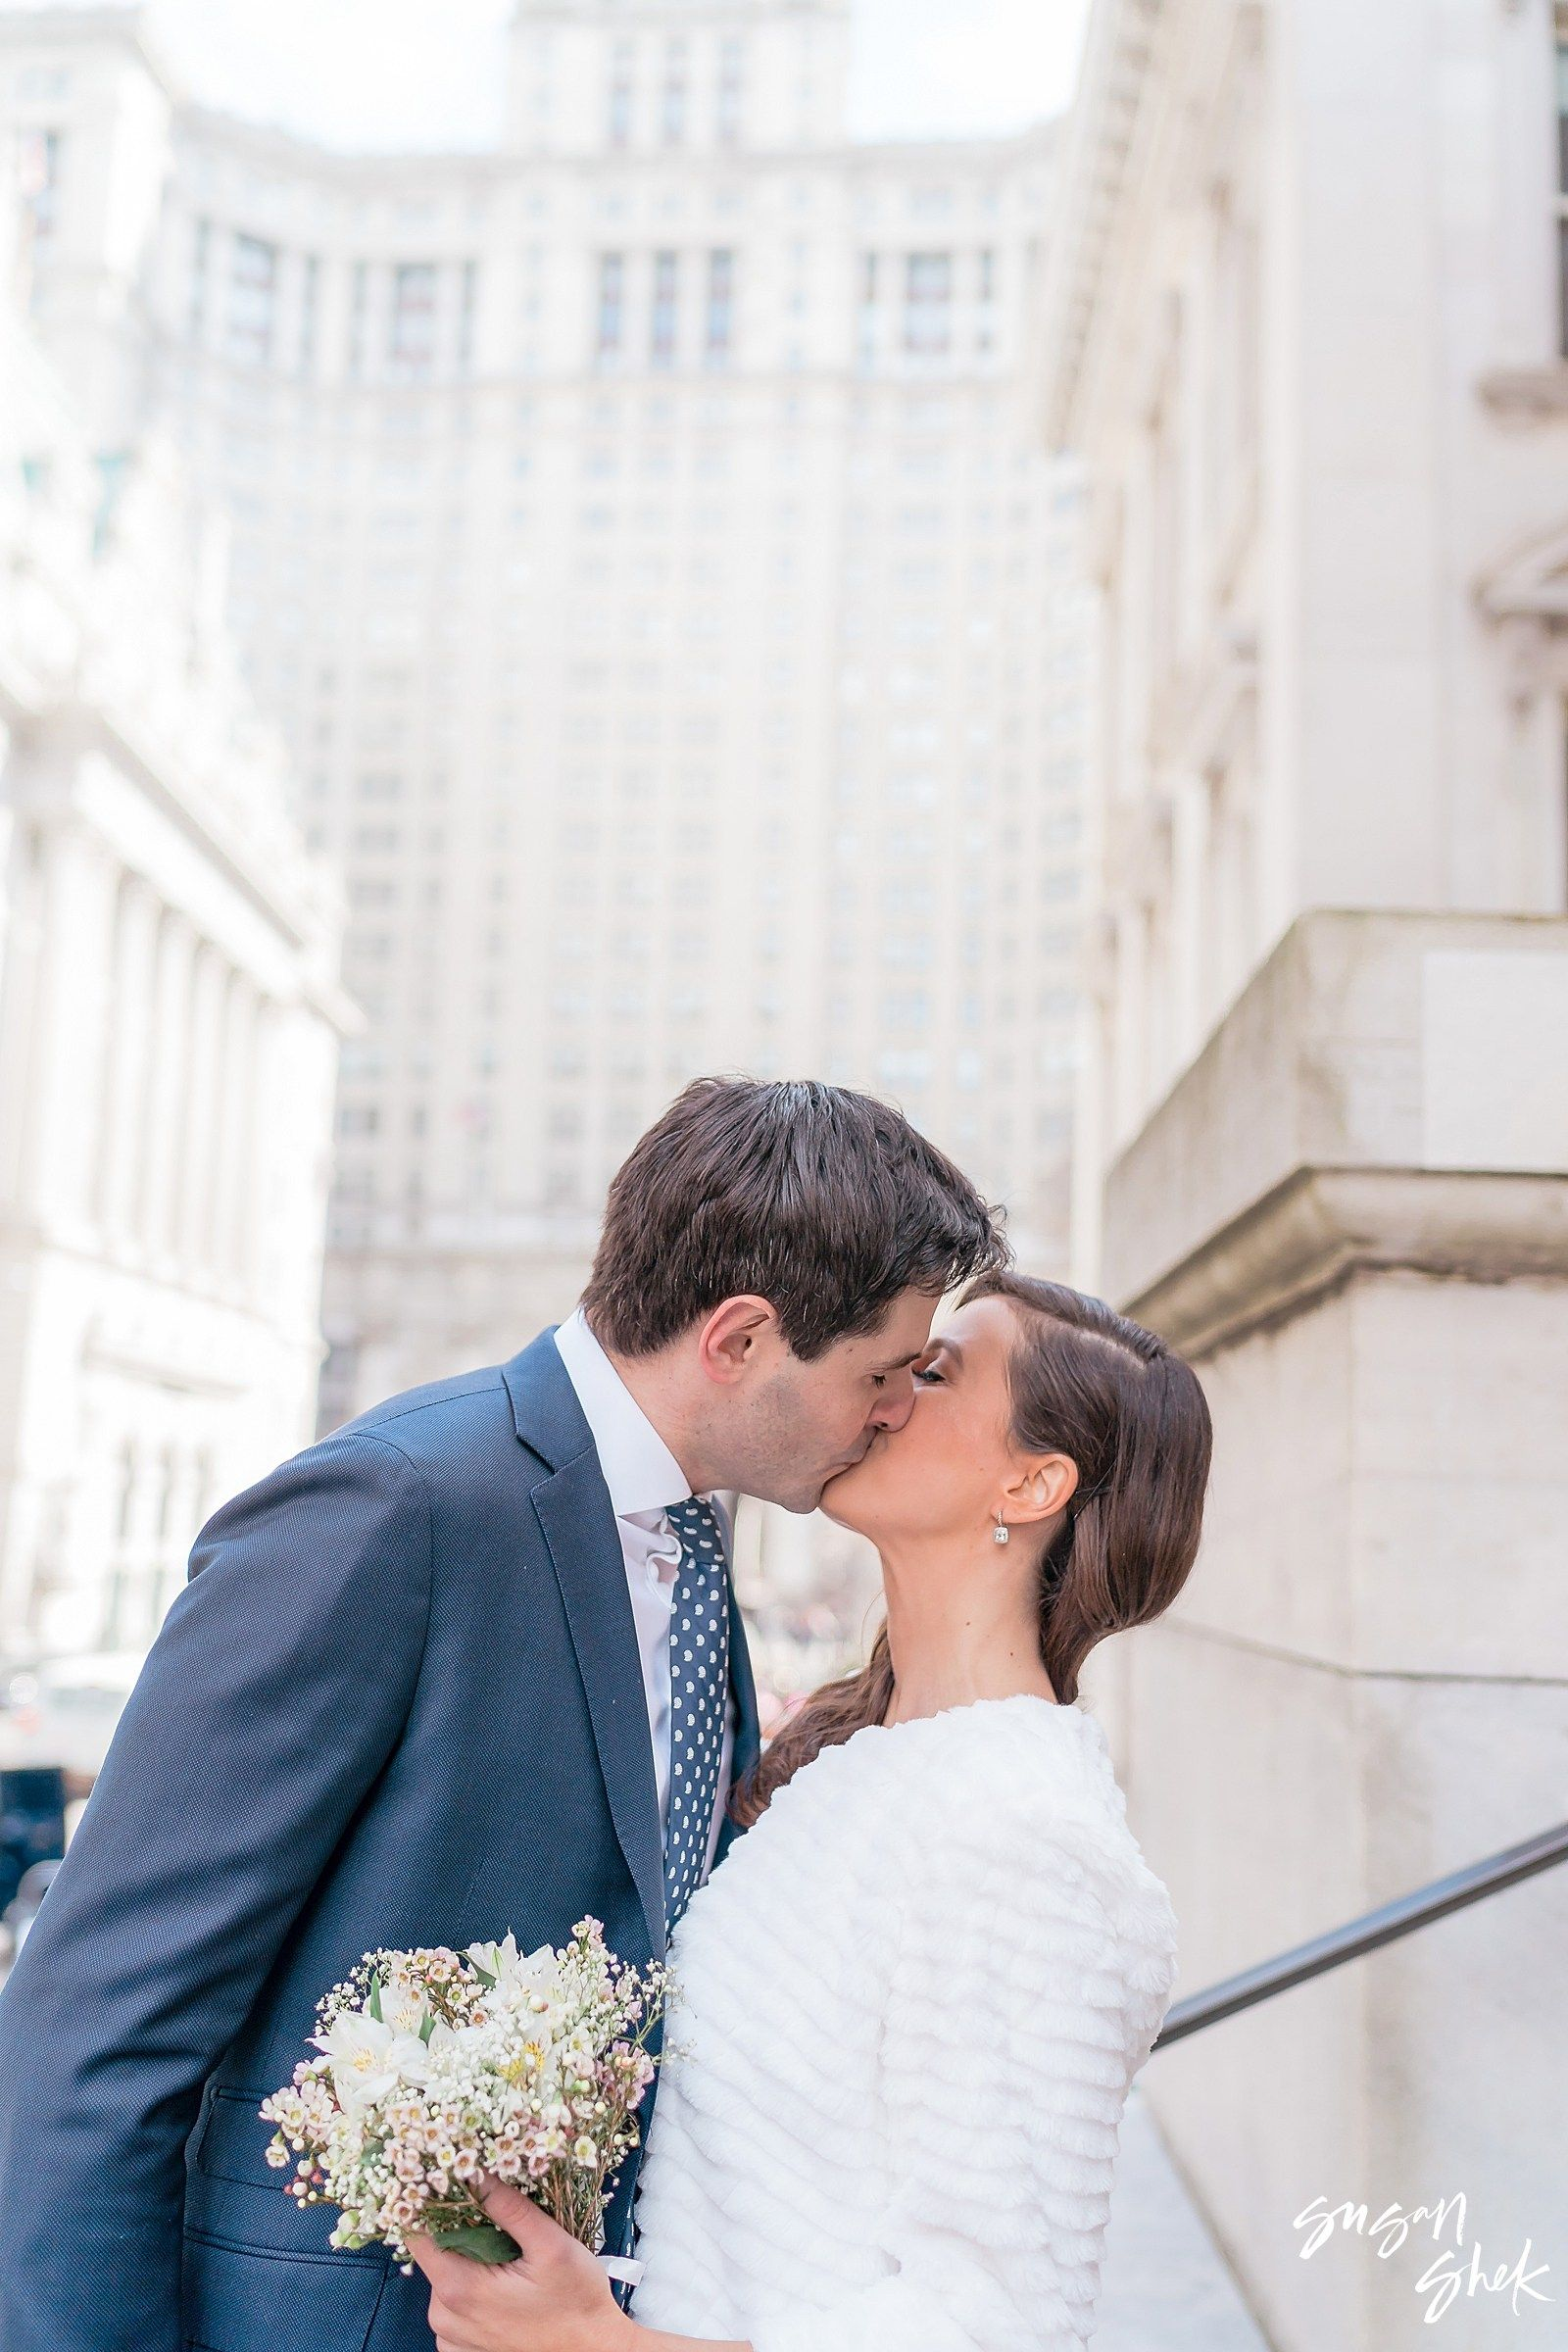 City Hall Wedding Photographer Susan Shek Photography in